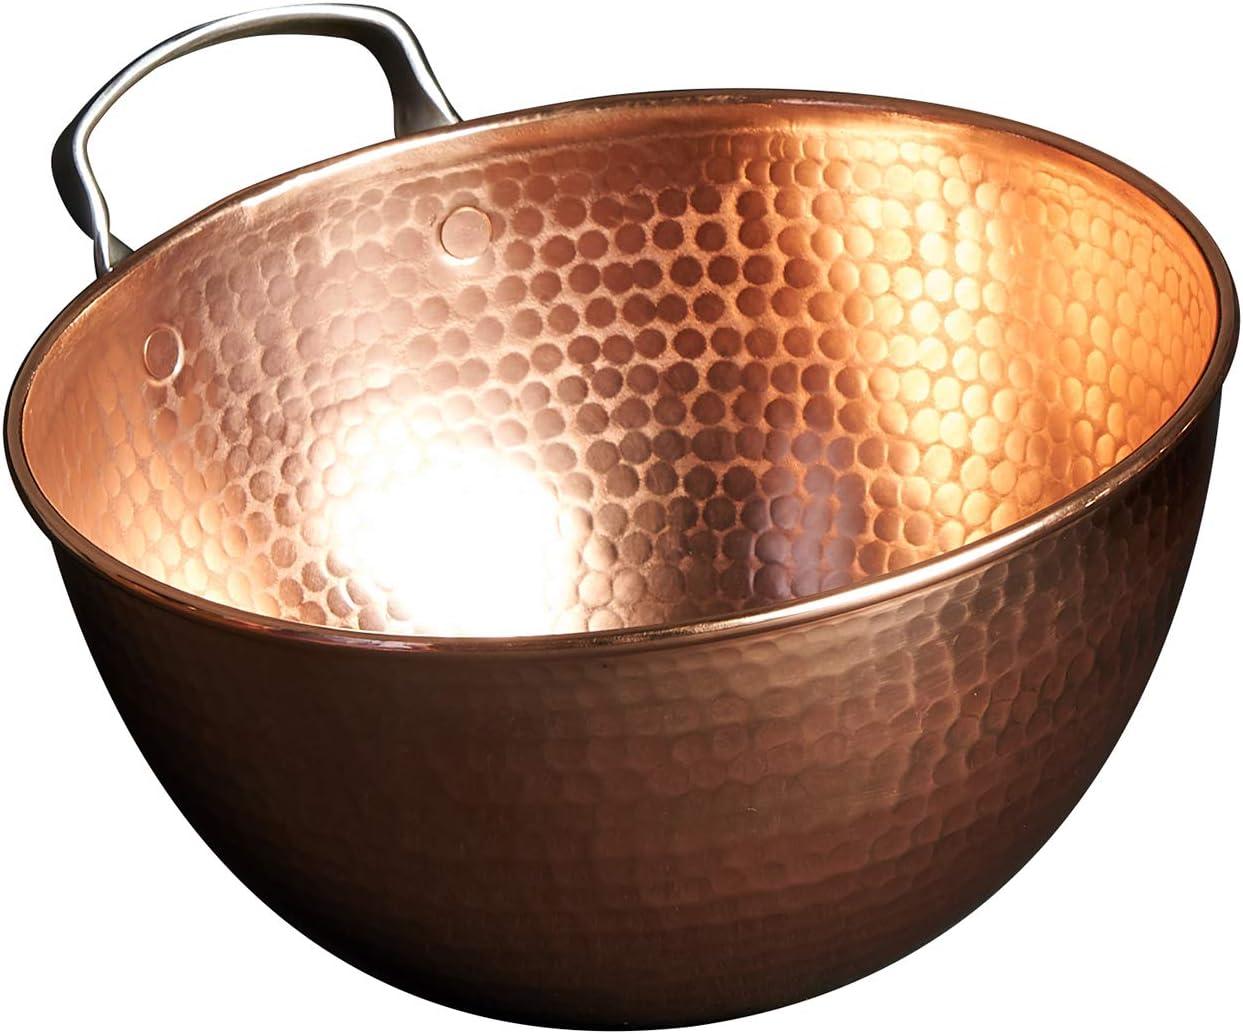 Sertodo Copper Austin Mall Mixing Bowl 6 inch quart Max 75% OFF diameter capacity 12